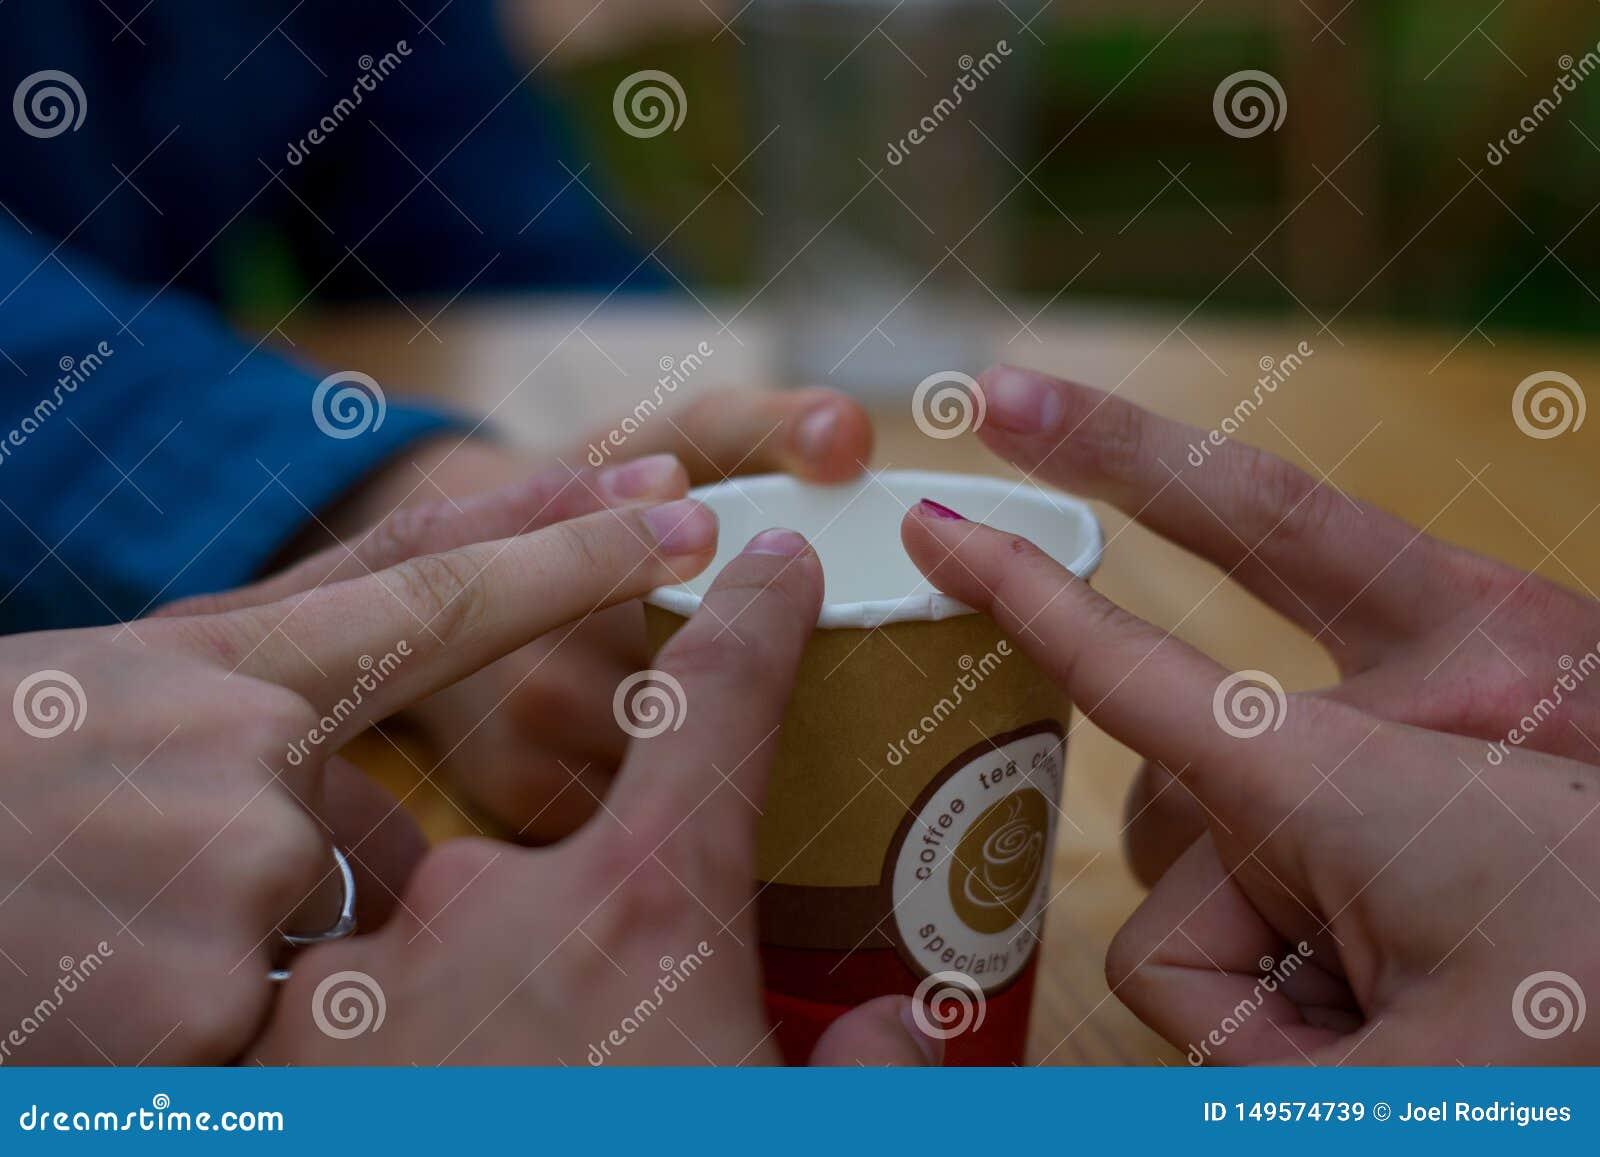 Linkebeek, Belgi? - Juni 08 2018: Groep vrienden wat betreft vinger op koffiekop